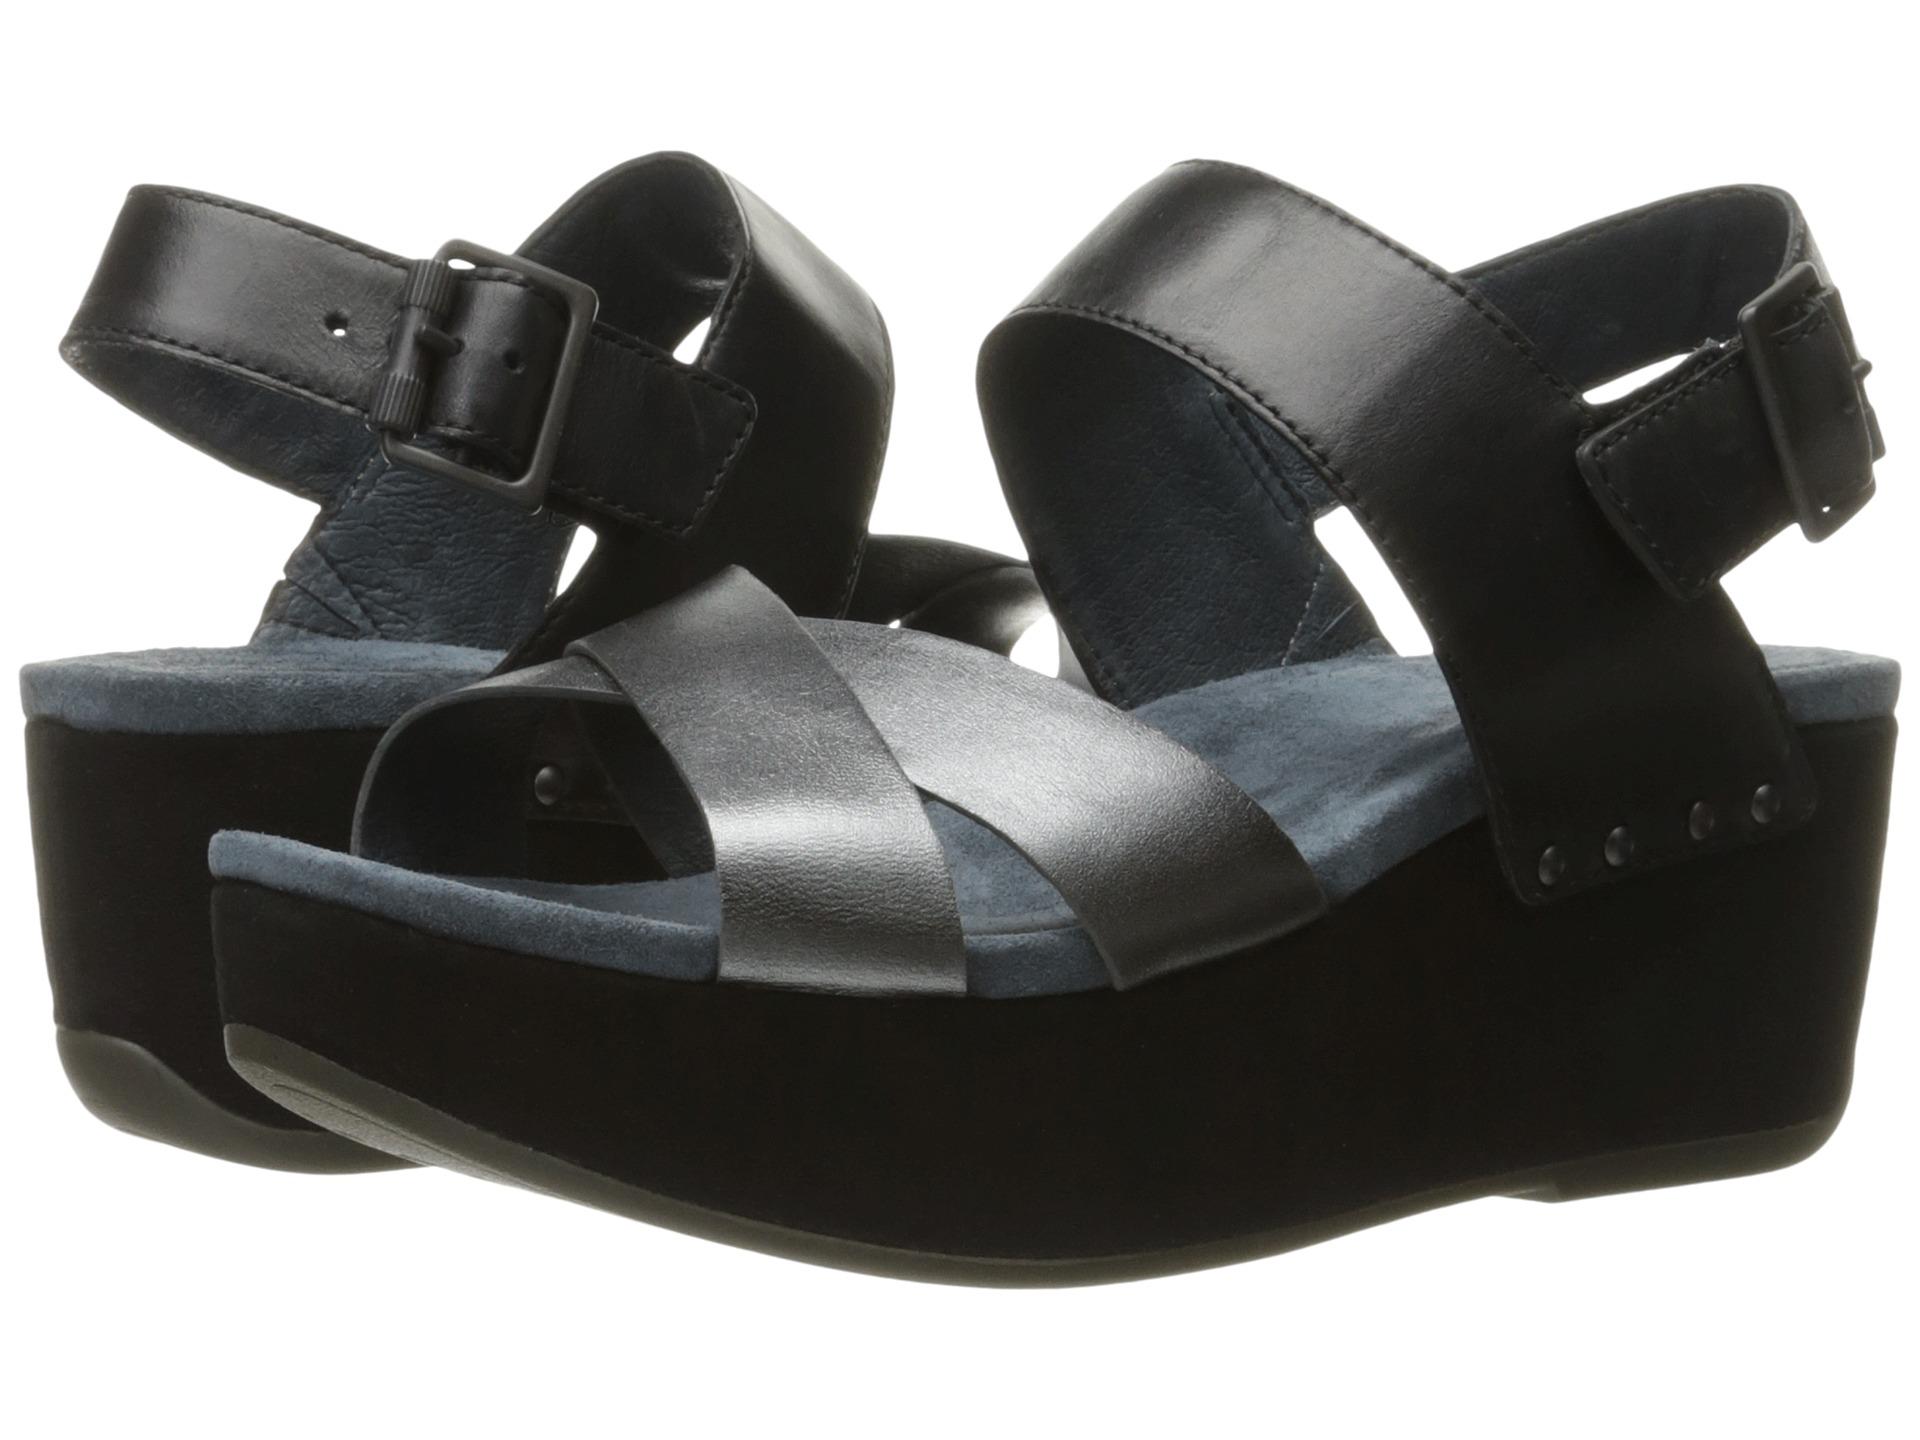 Black dansko sandals - View More Like This Dansko Stasia